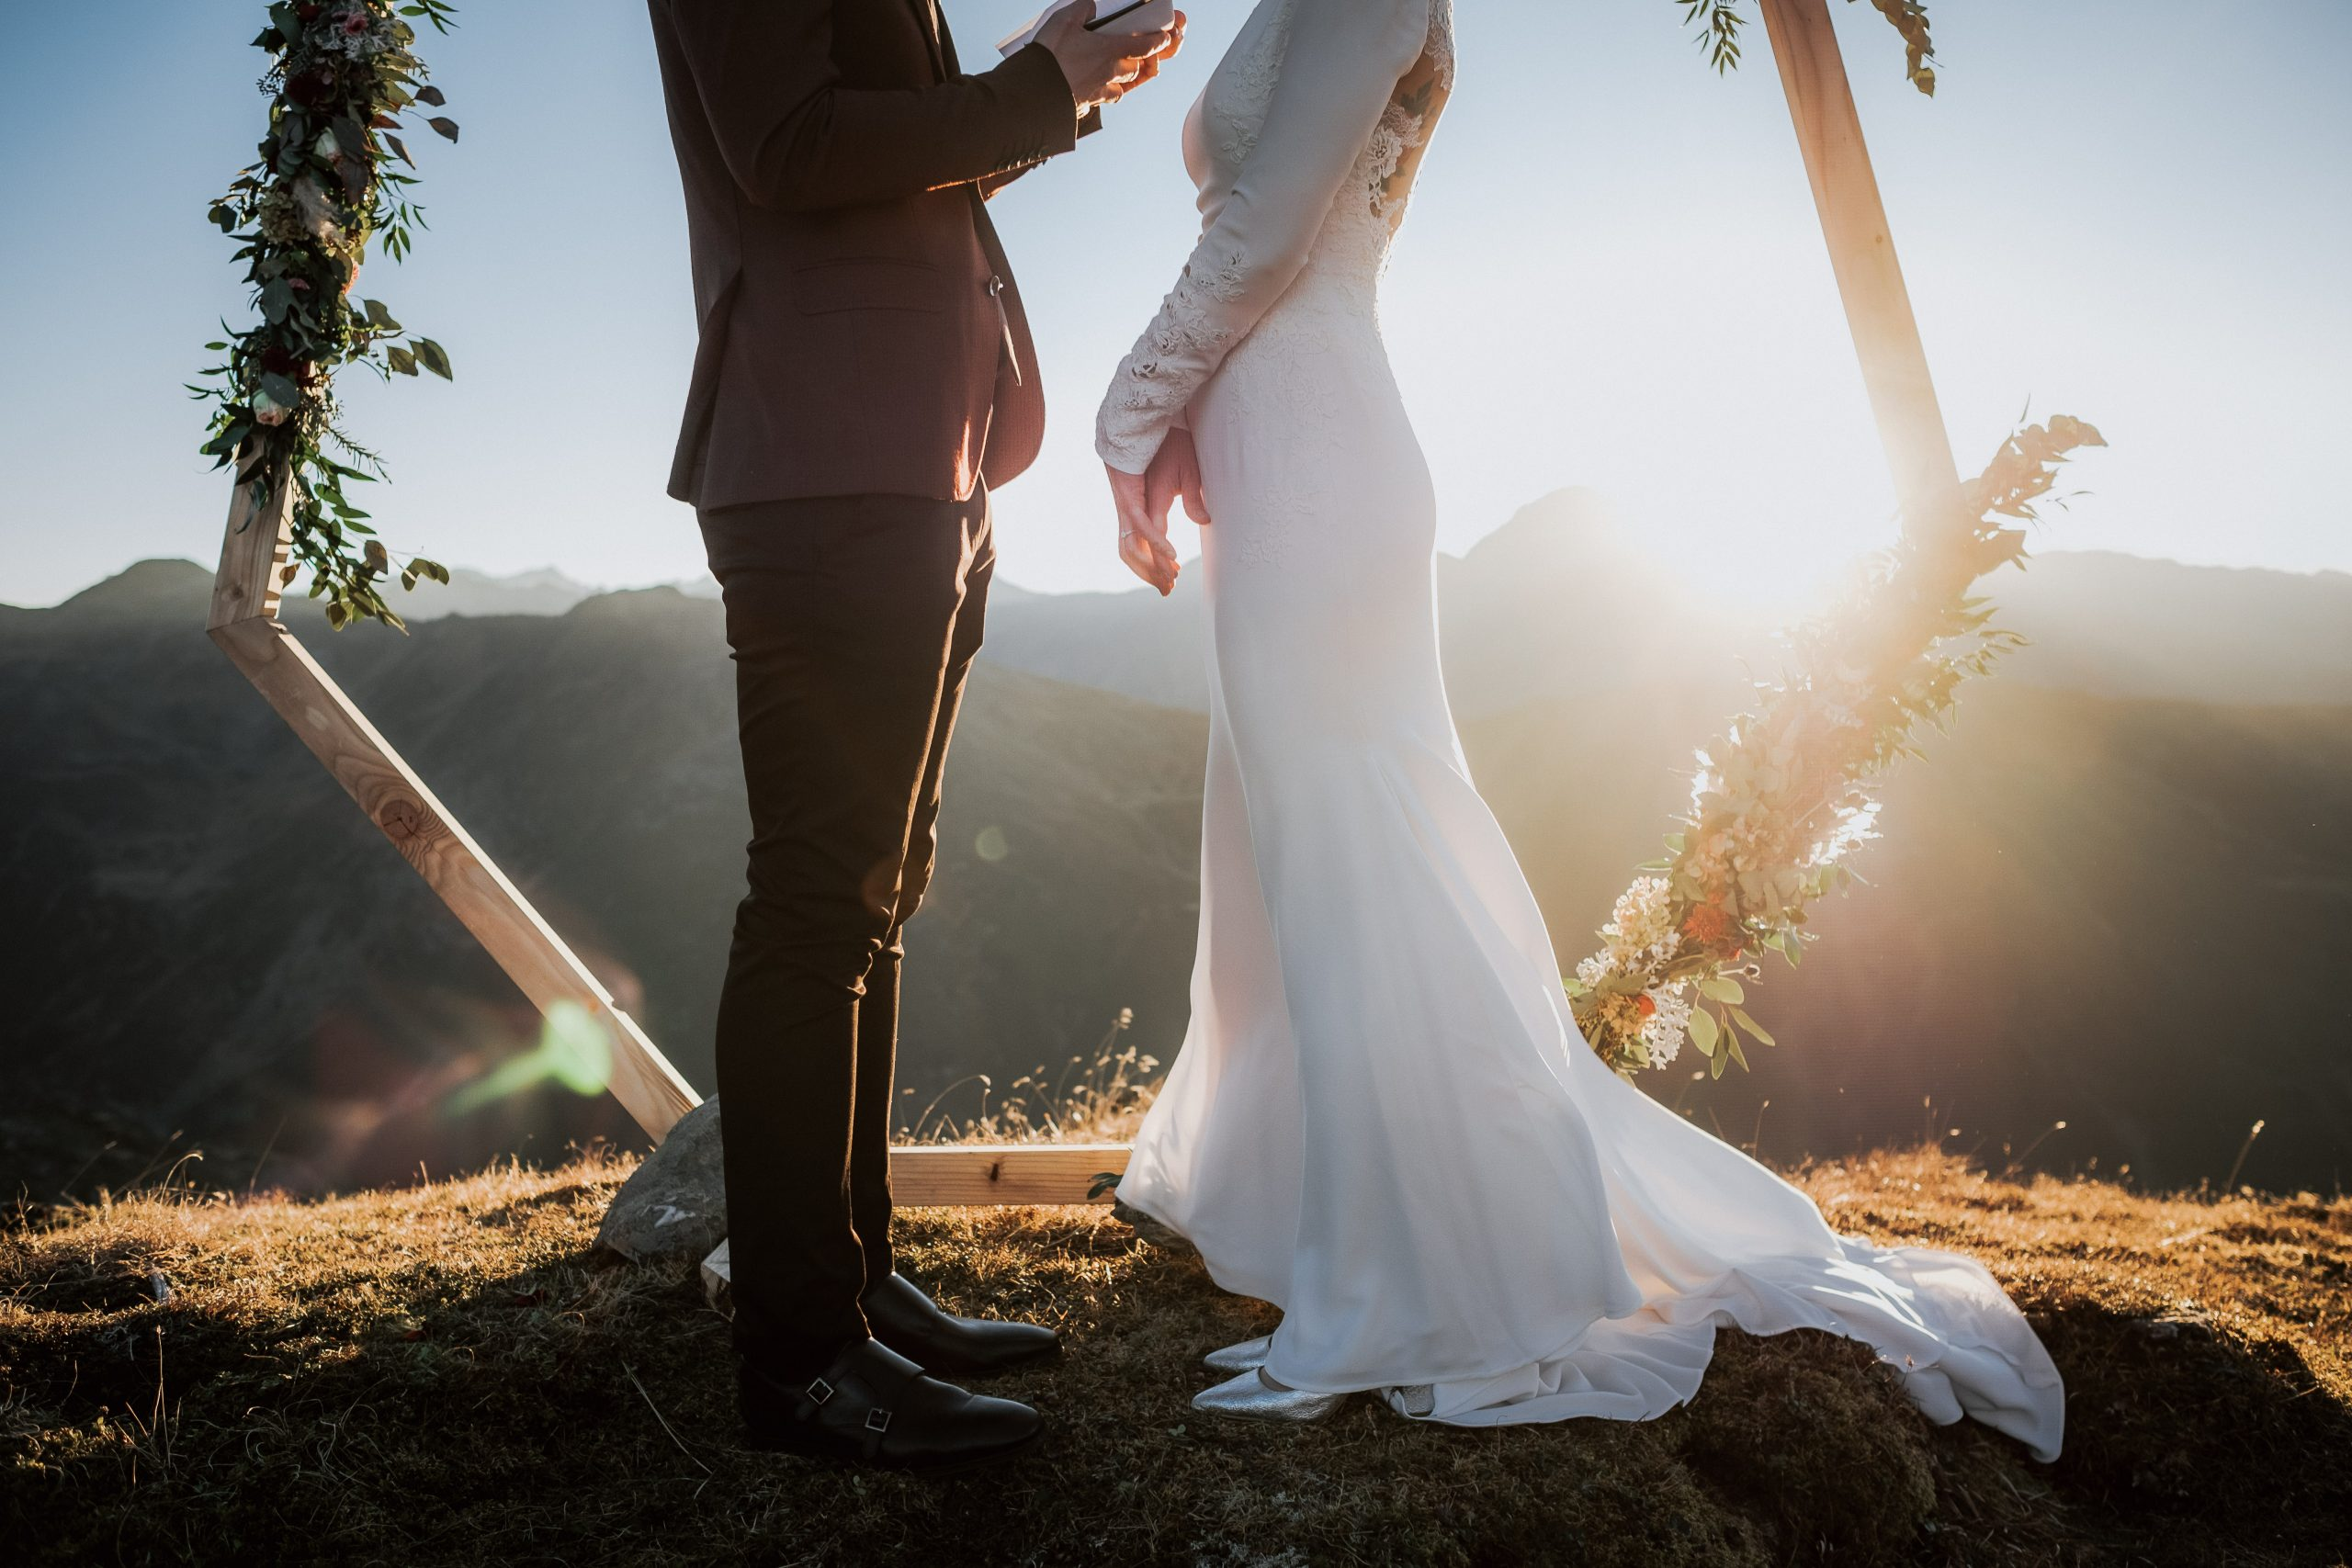 Blitzkneisser-Photo-Mountain-Wedding-Tyrol-140